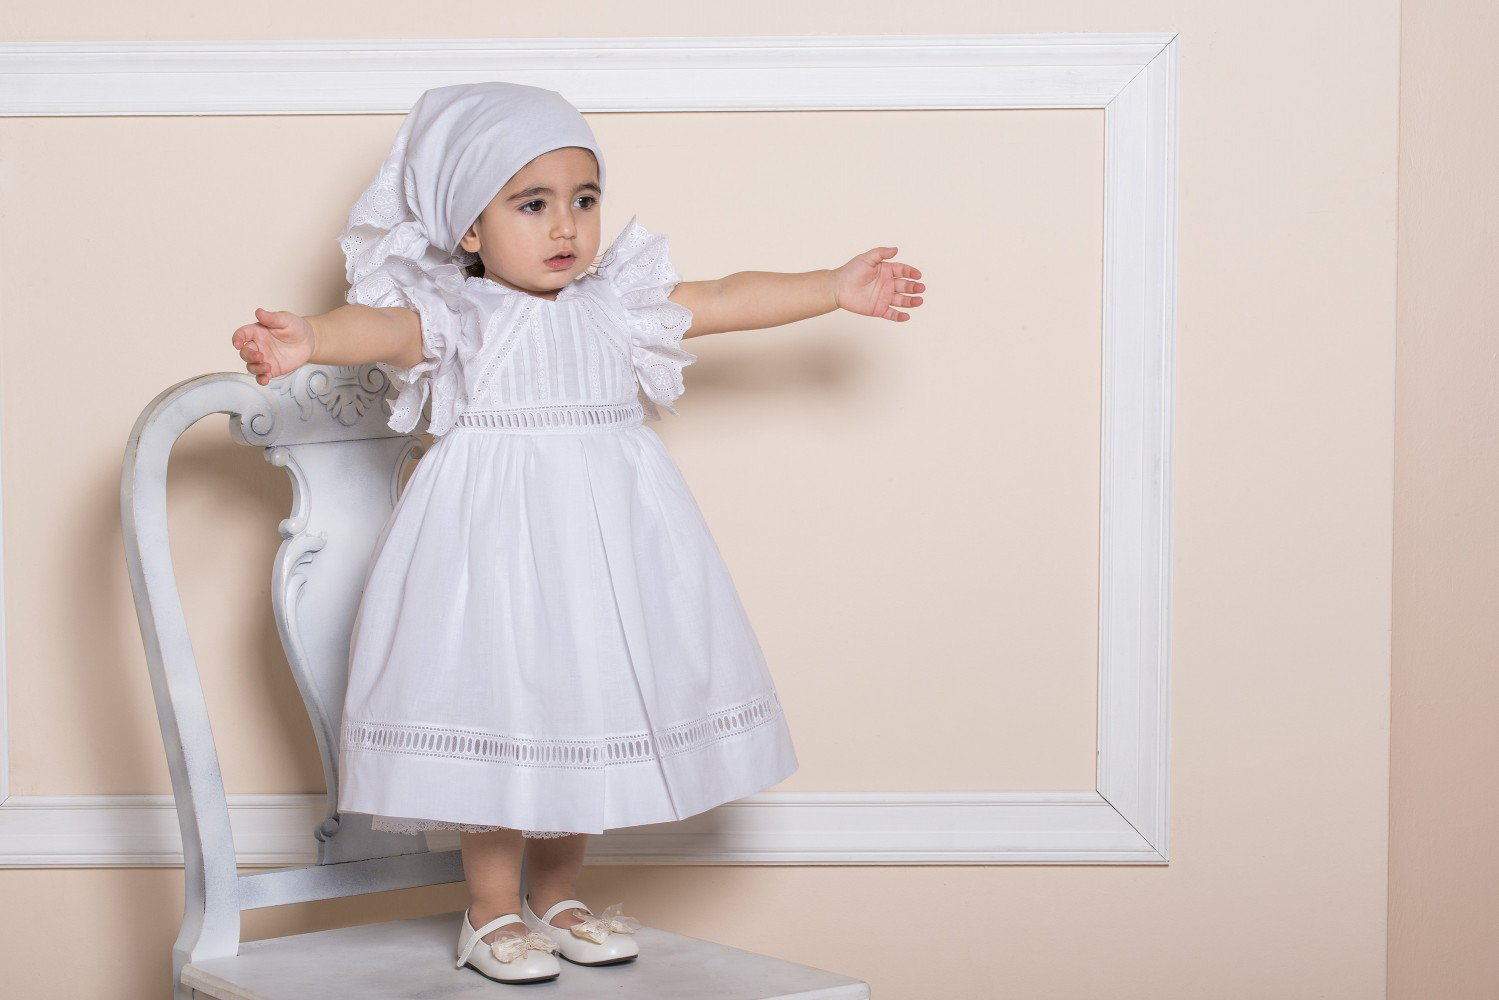 a6d472755221 La joie - Χαλακατεβάκη Άννα - Βαπτιστικά Είδη